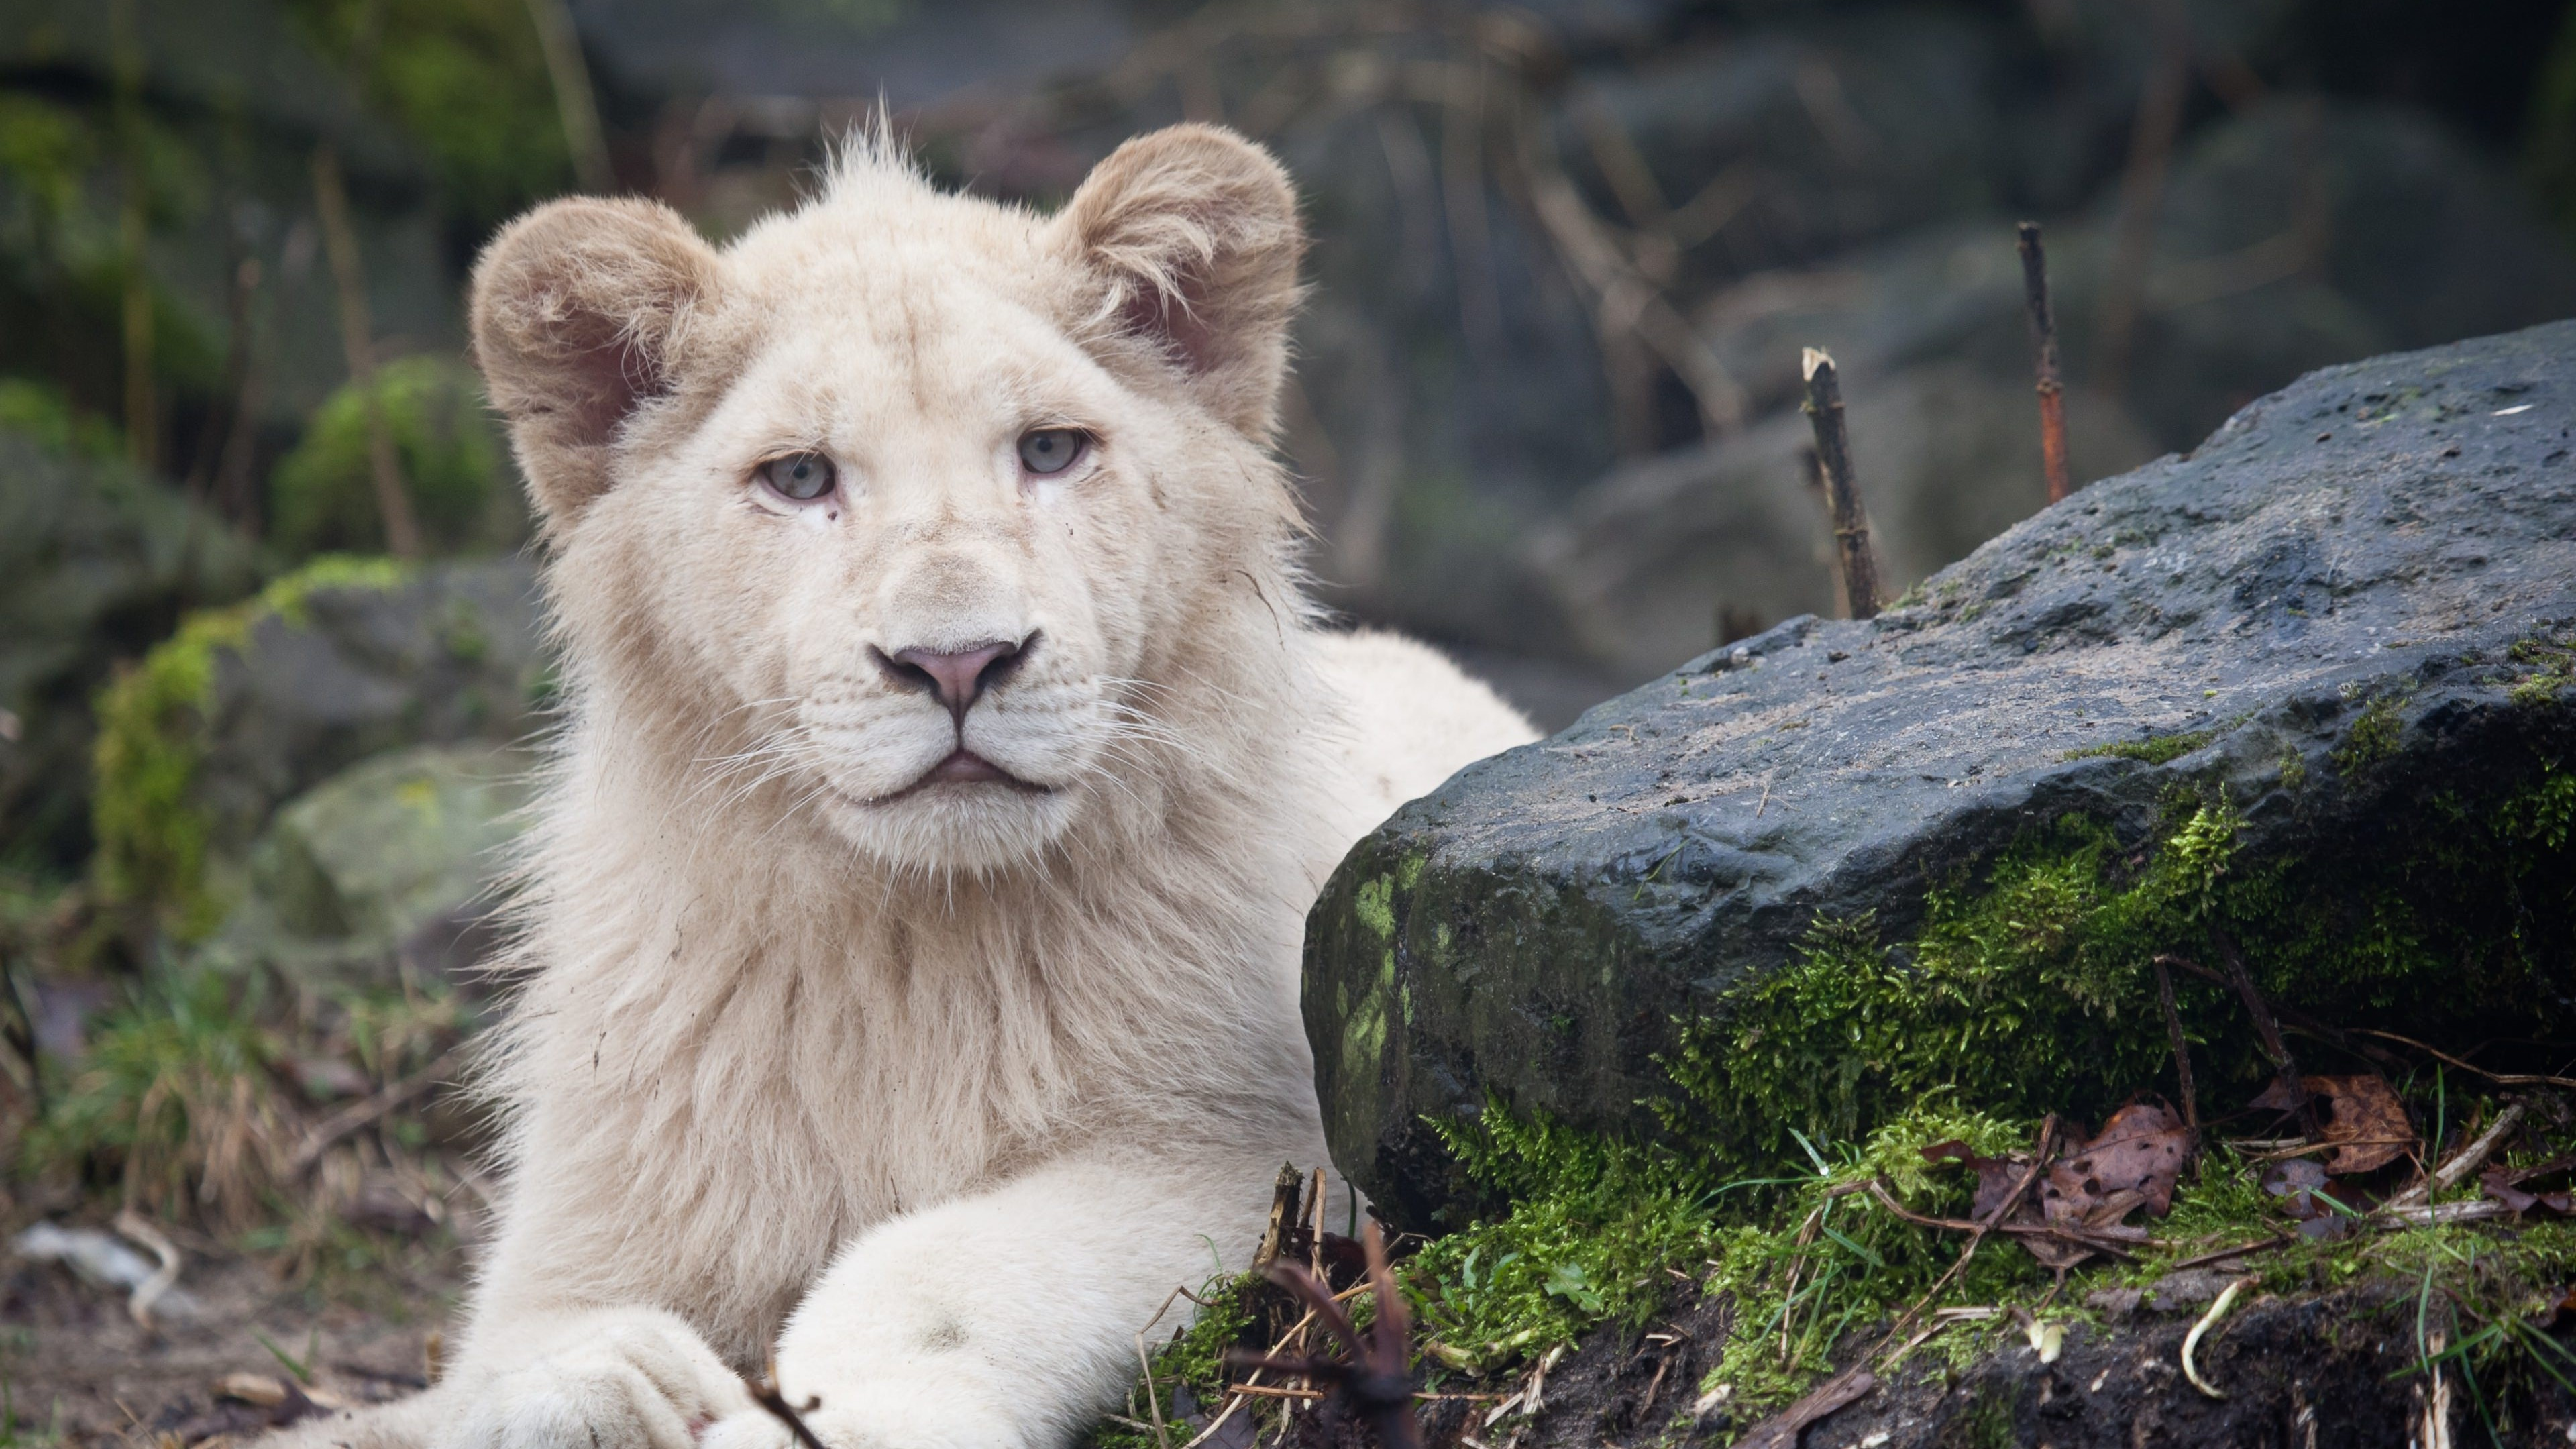 white lions 29796 4k wallpaper